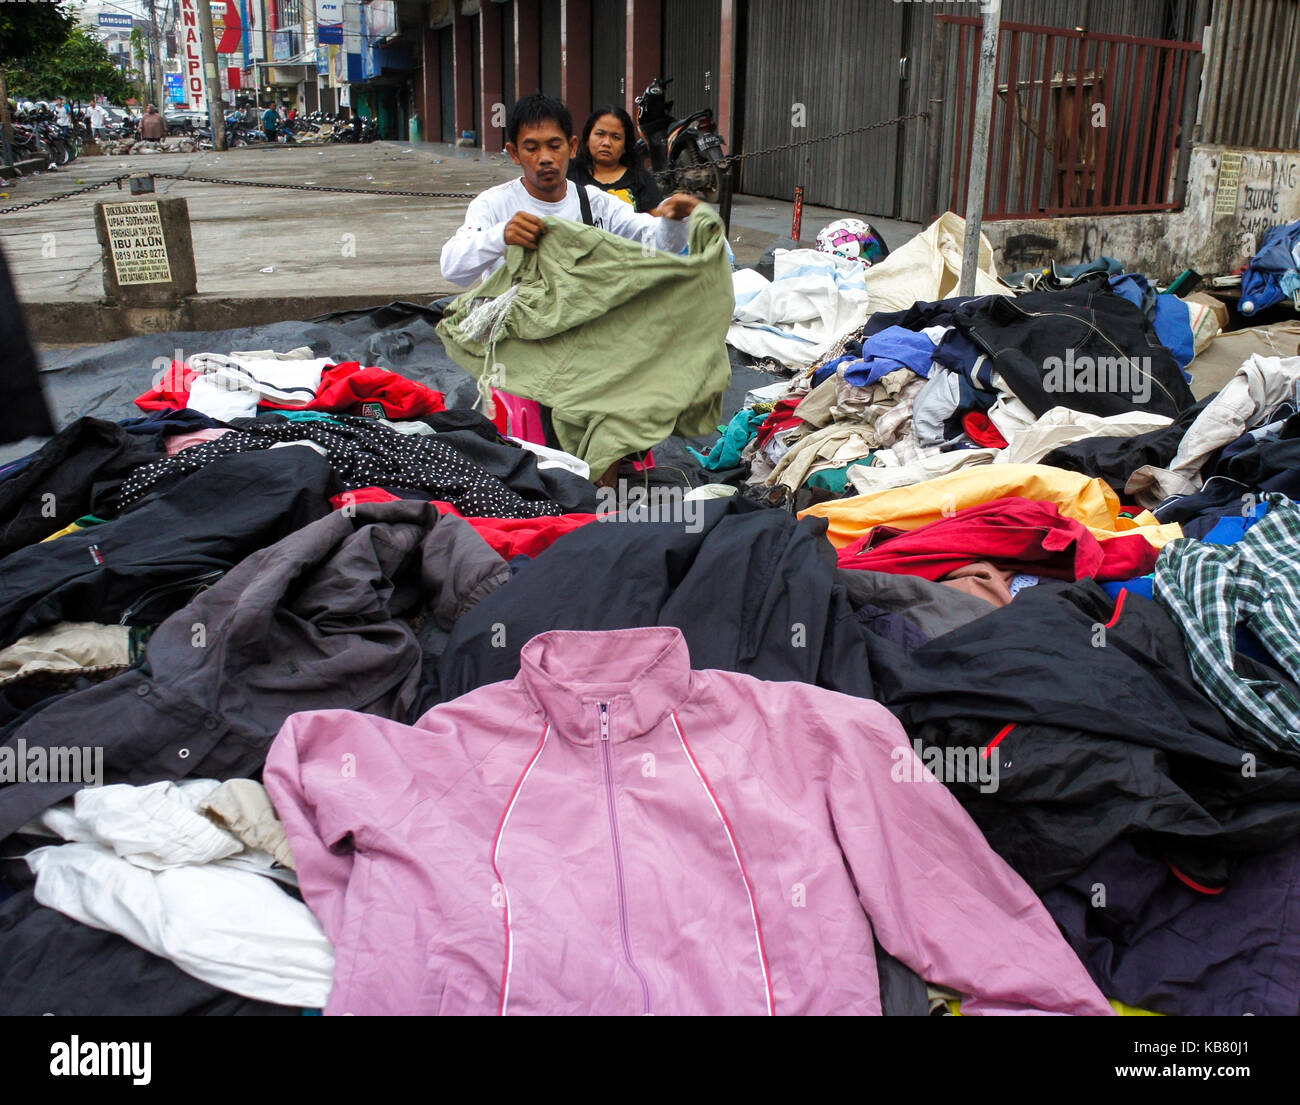 street vendor sells used cloths, Palembang City, South Sumatera, Indonesia - Stock Image